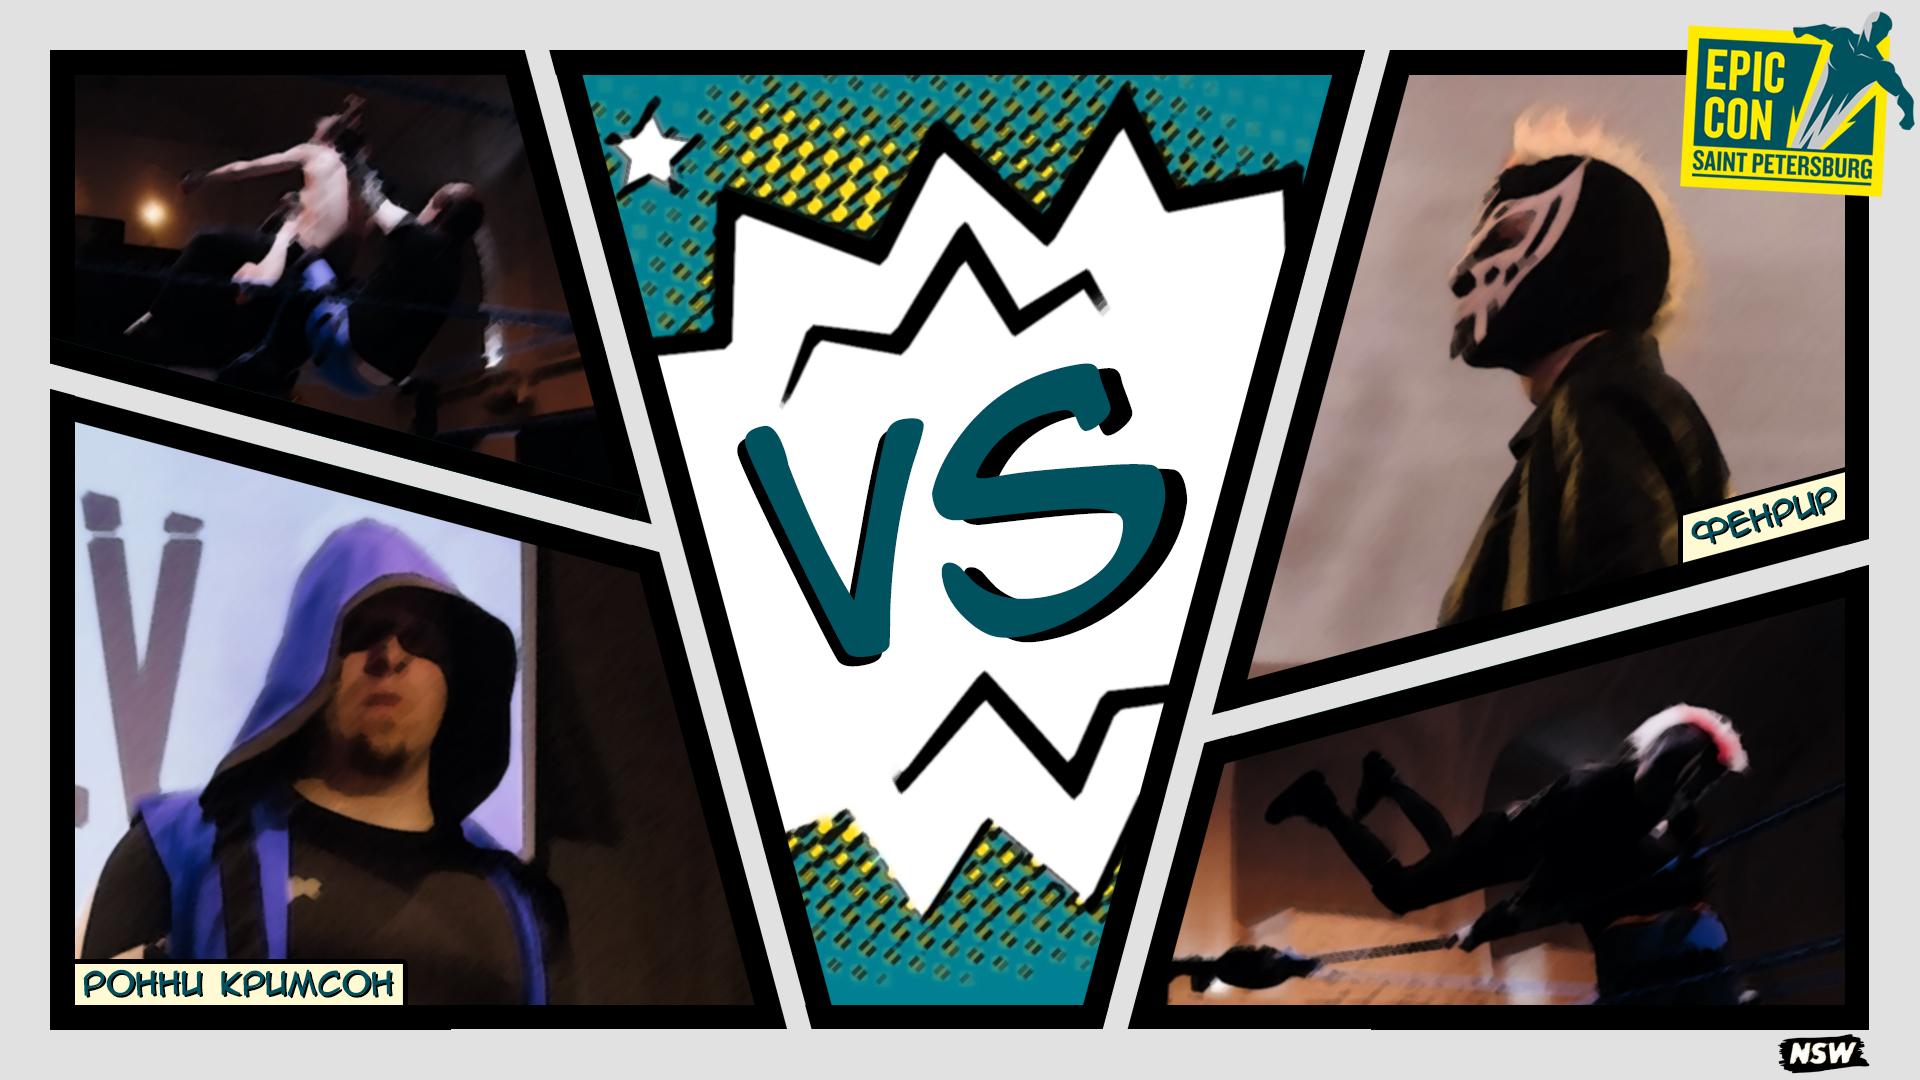 NSW Epic Con 2017: Ронни Кримсон против Фенрира